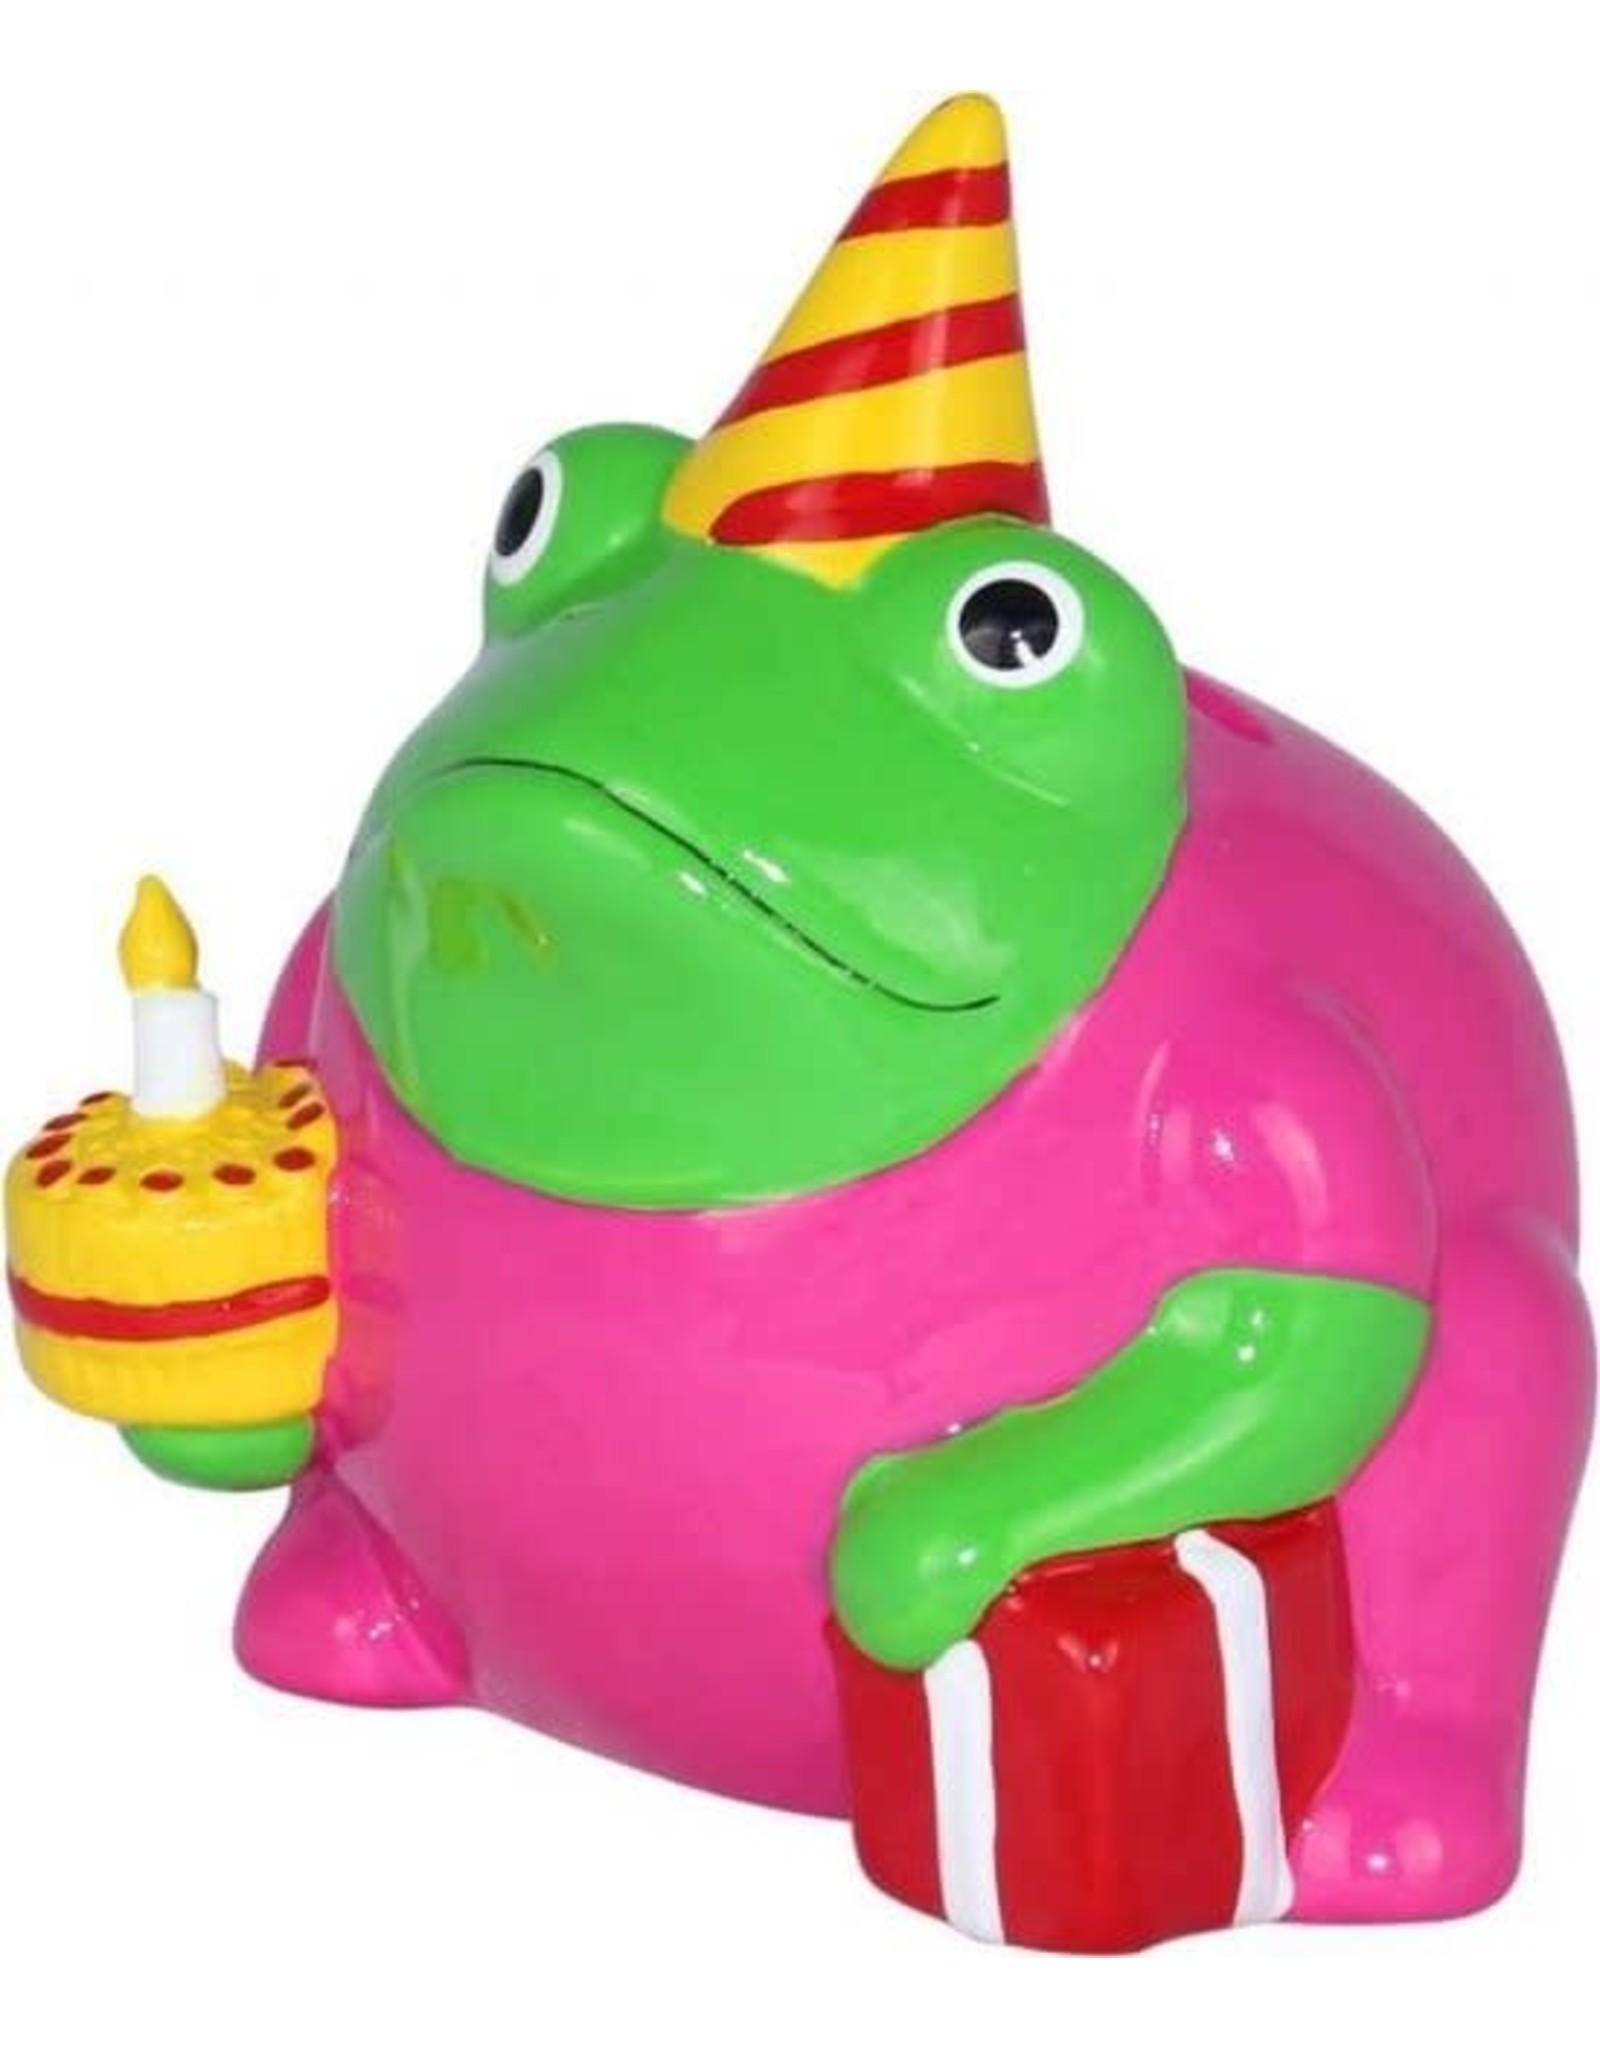 "pomme-pidou Pomme-Pidou. MONEY BOX ""BIRTHDAY FREDDY"" - FROGMANIA - S"